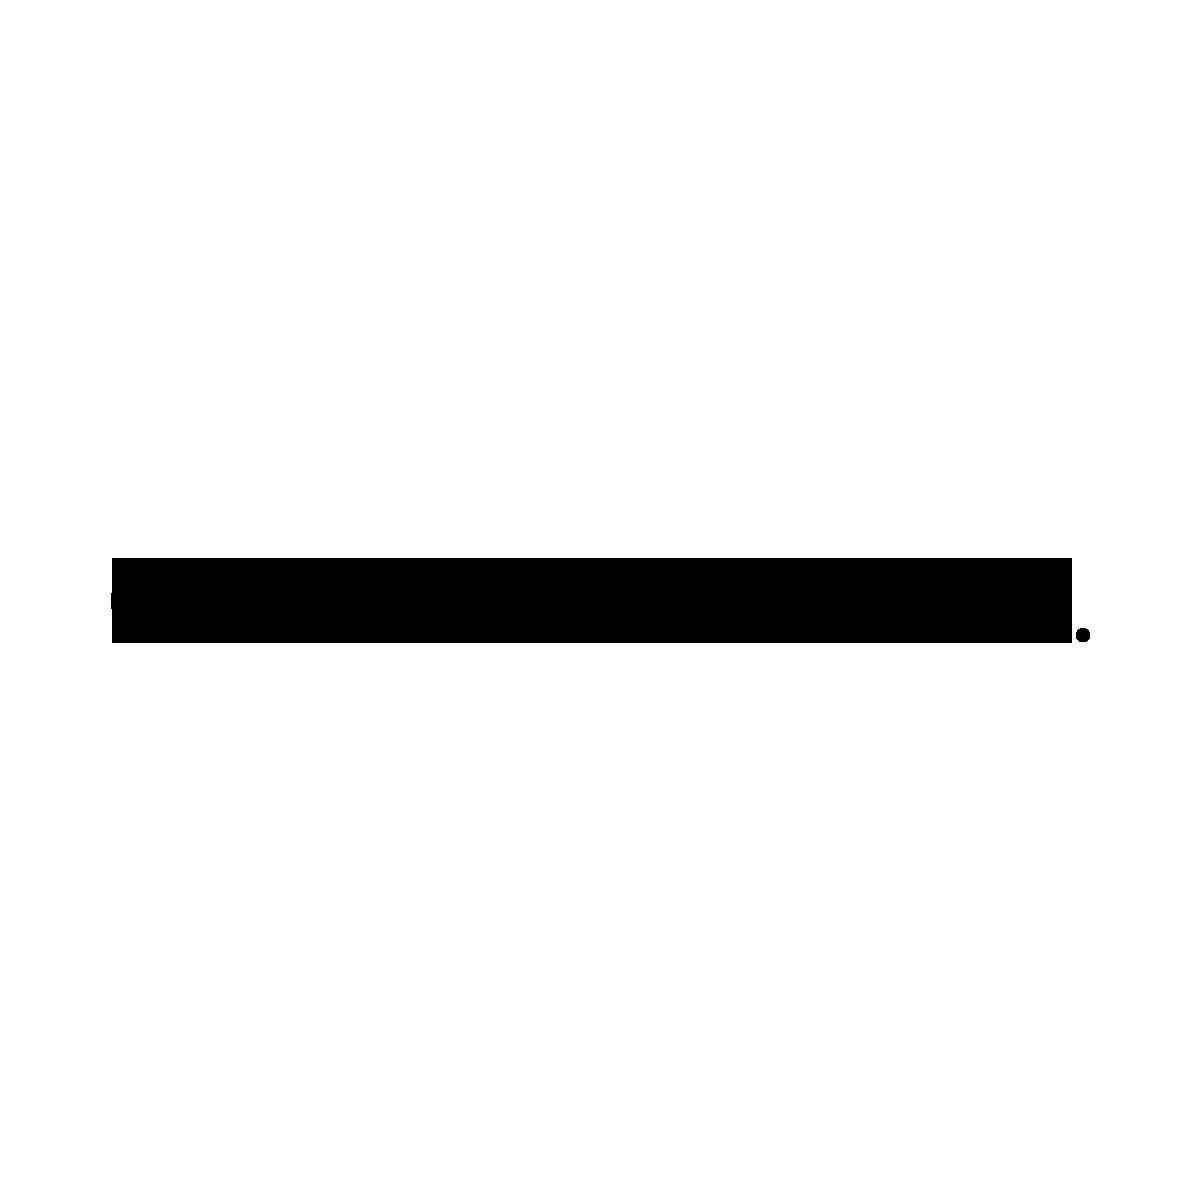 Olive-green-crocodile-print-bag-